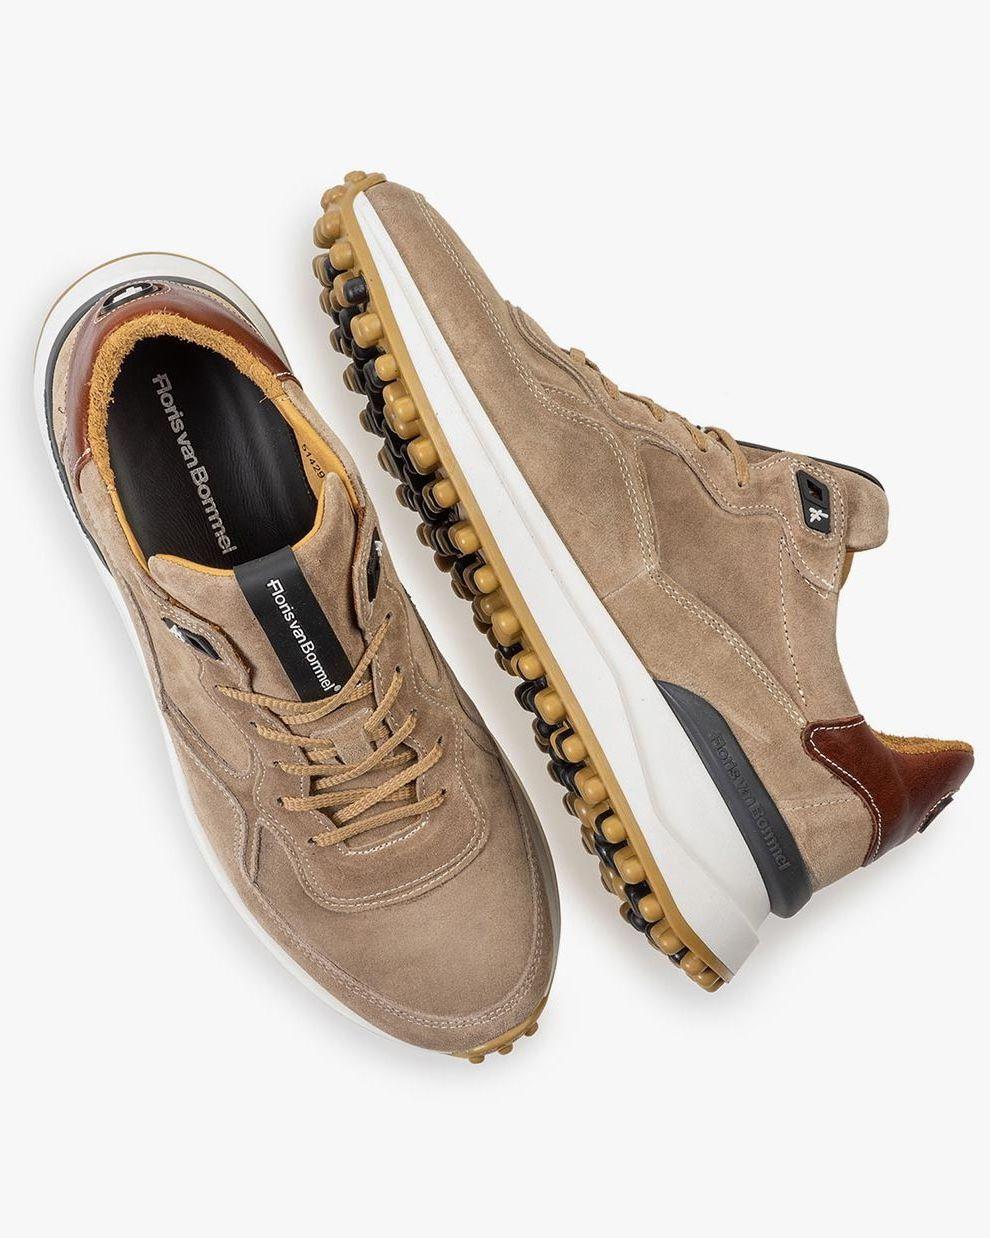 Beige suede leather sneaker 16301/19   Floris van Bommel Official